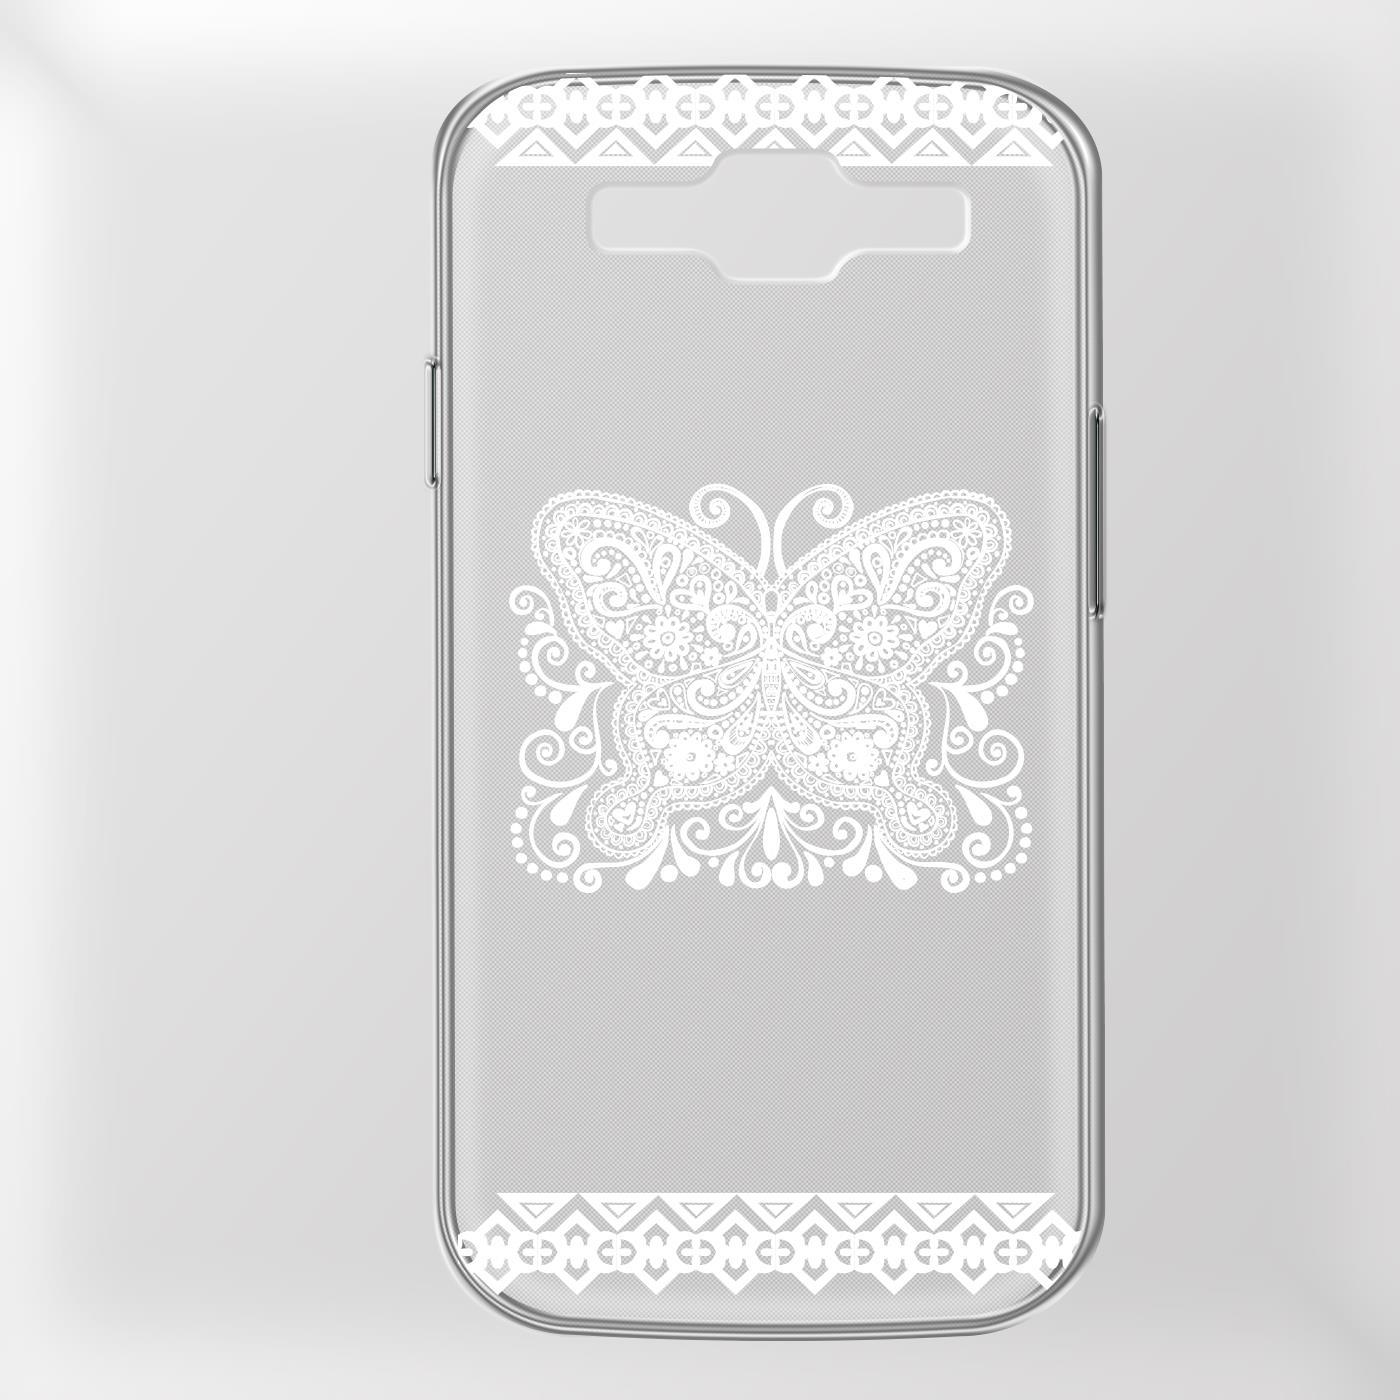 Samsung-Galaxy-S3-Neo-Handy-Schutz-Huelle-Case-TPU-Silikon-Cover-Tasche-Mandala Indexbild 7